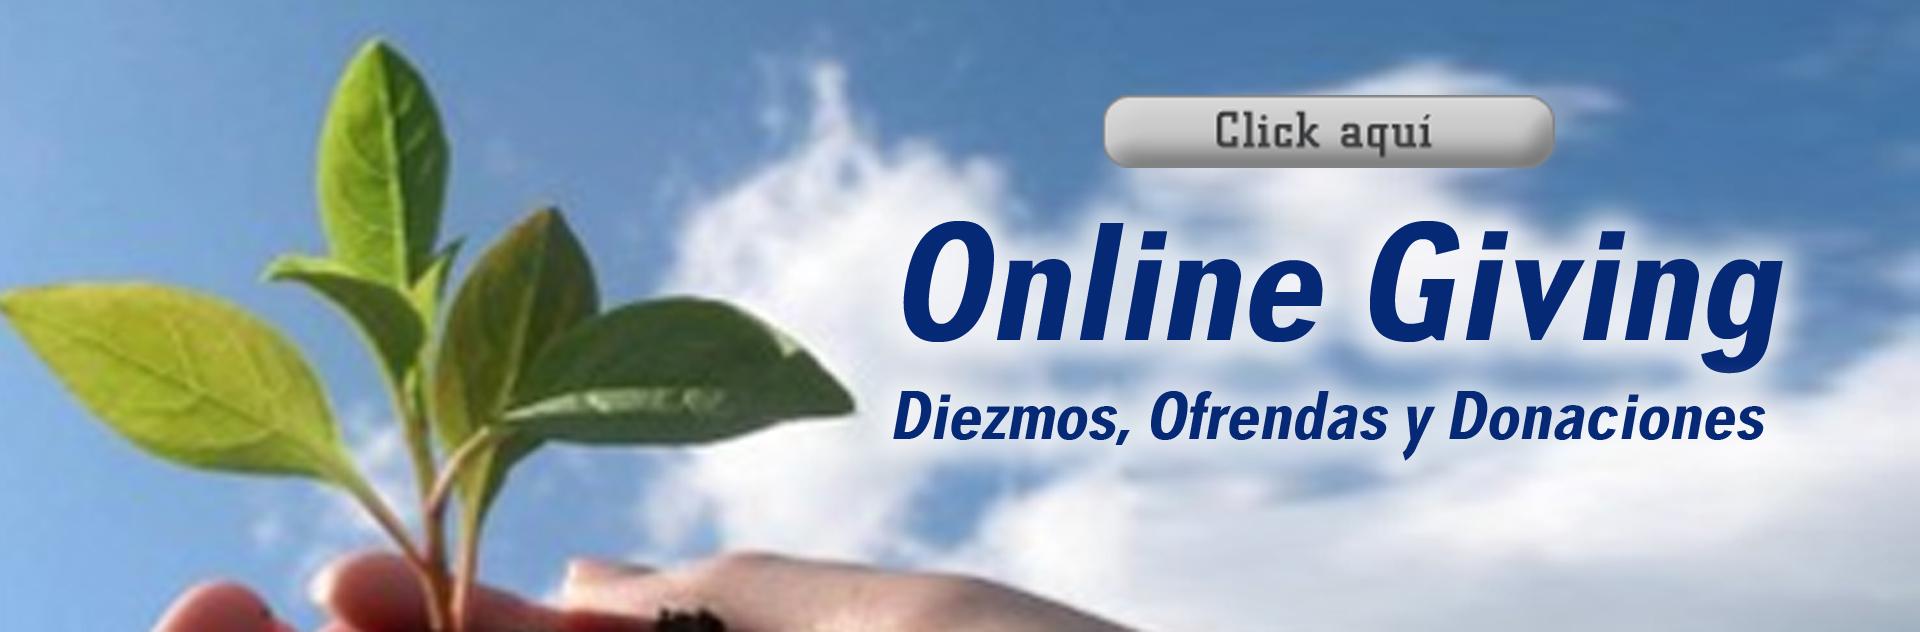 download Значение византийских занятий в